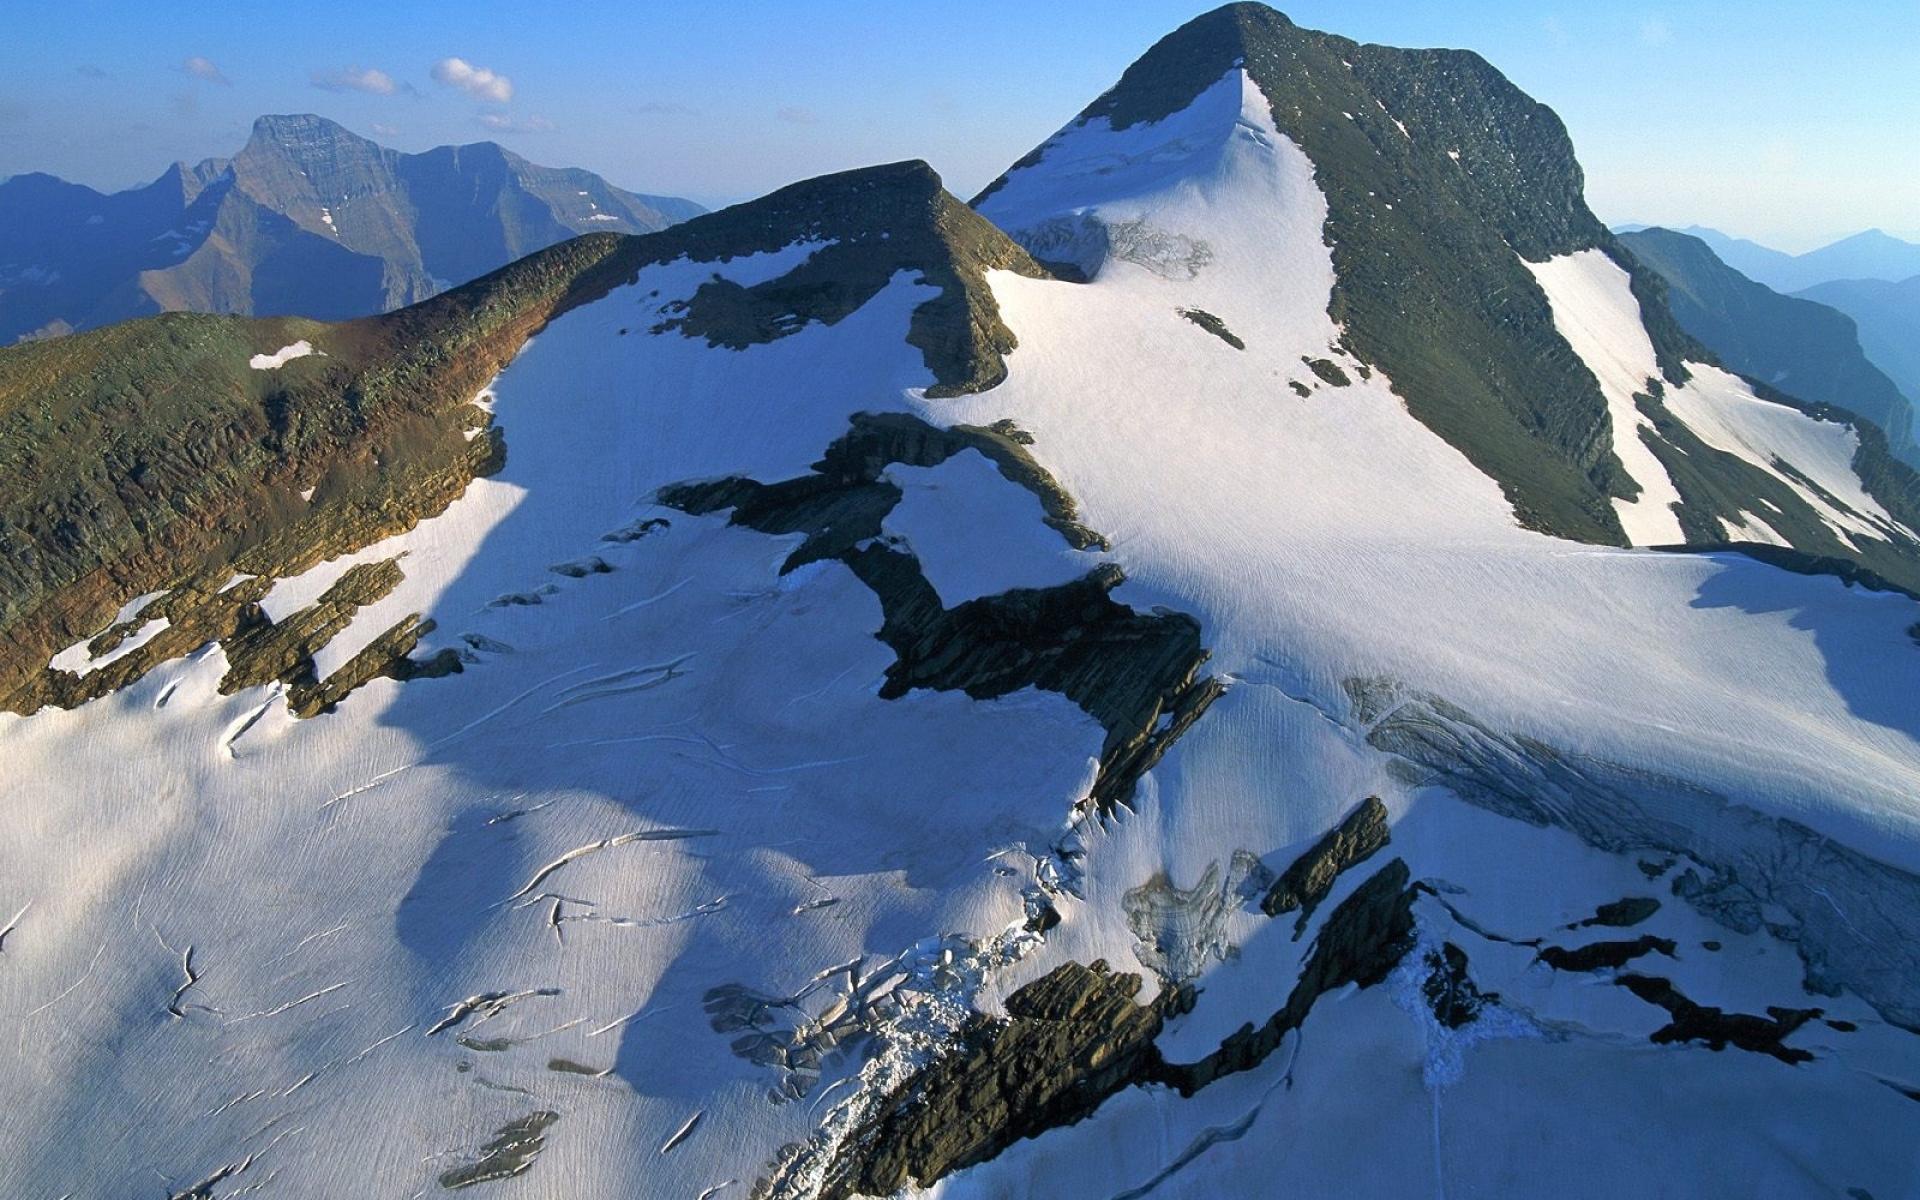 Картинки Горы, снег, камни, небо фото и обои на рабочий стол